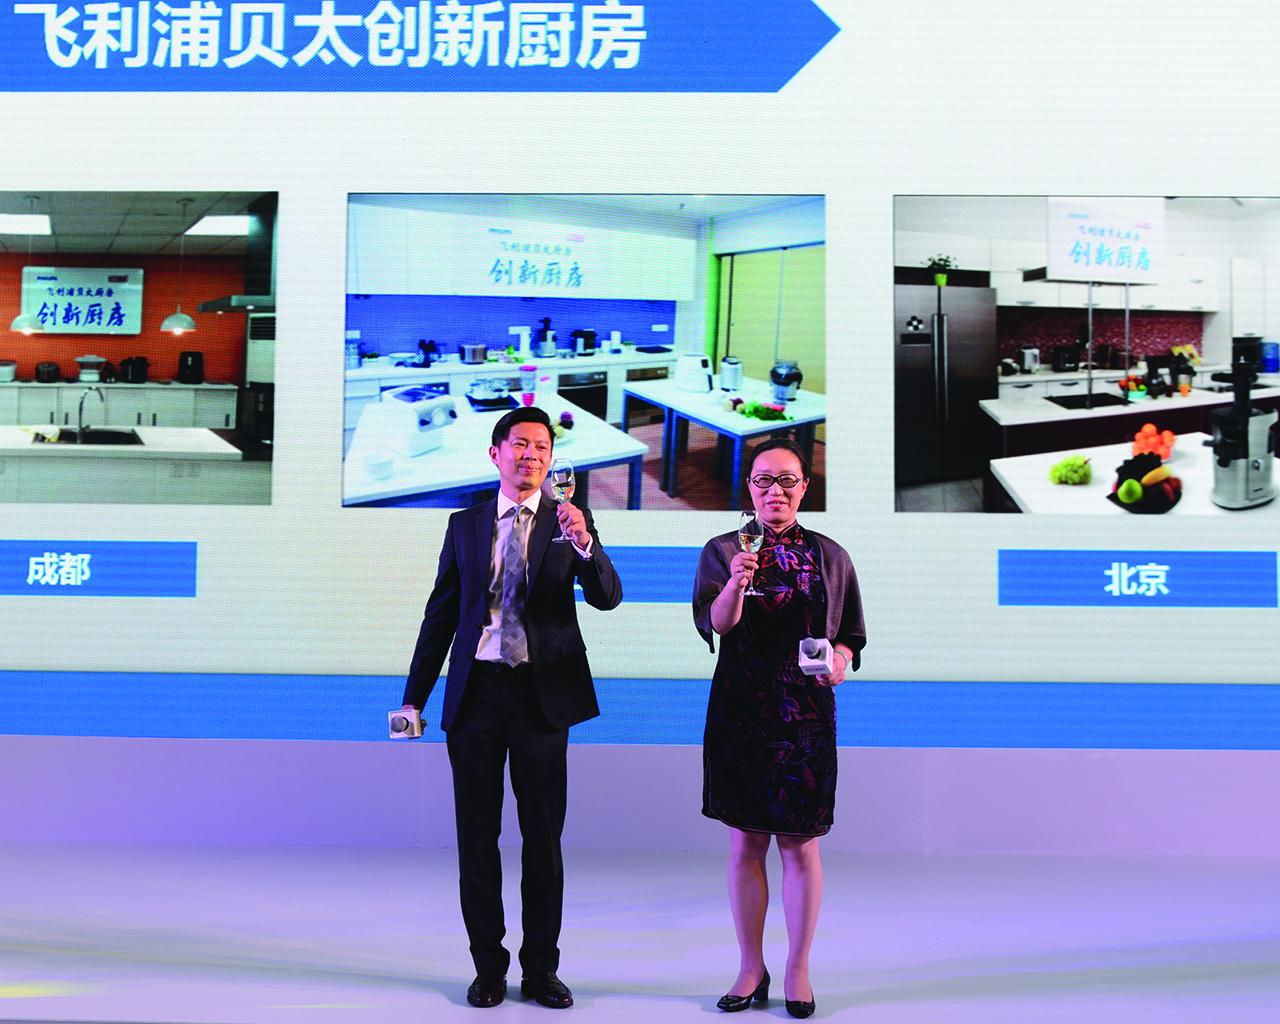 Philips: New Ways to Launch New Products | FleishmanHillard in China